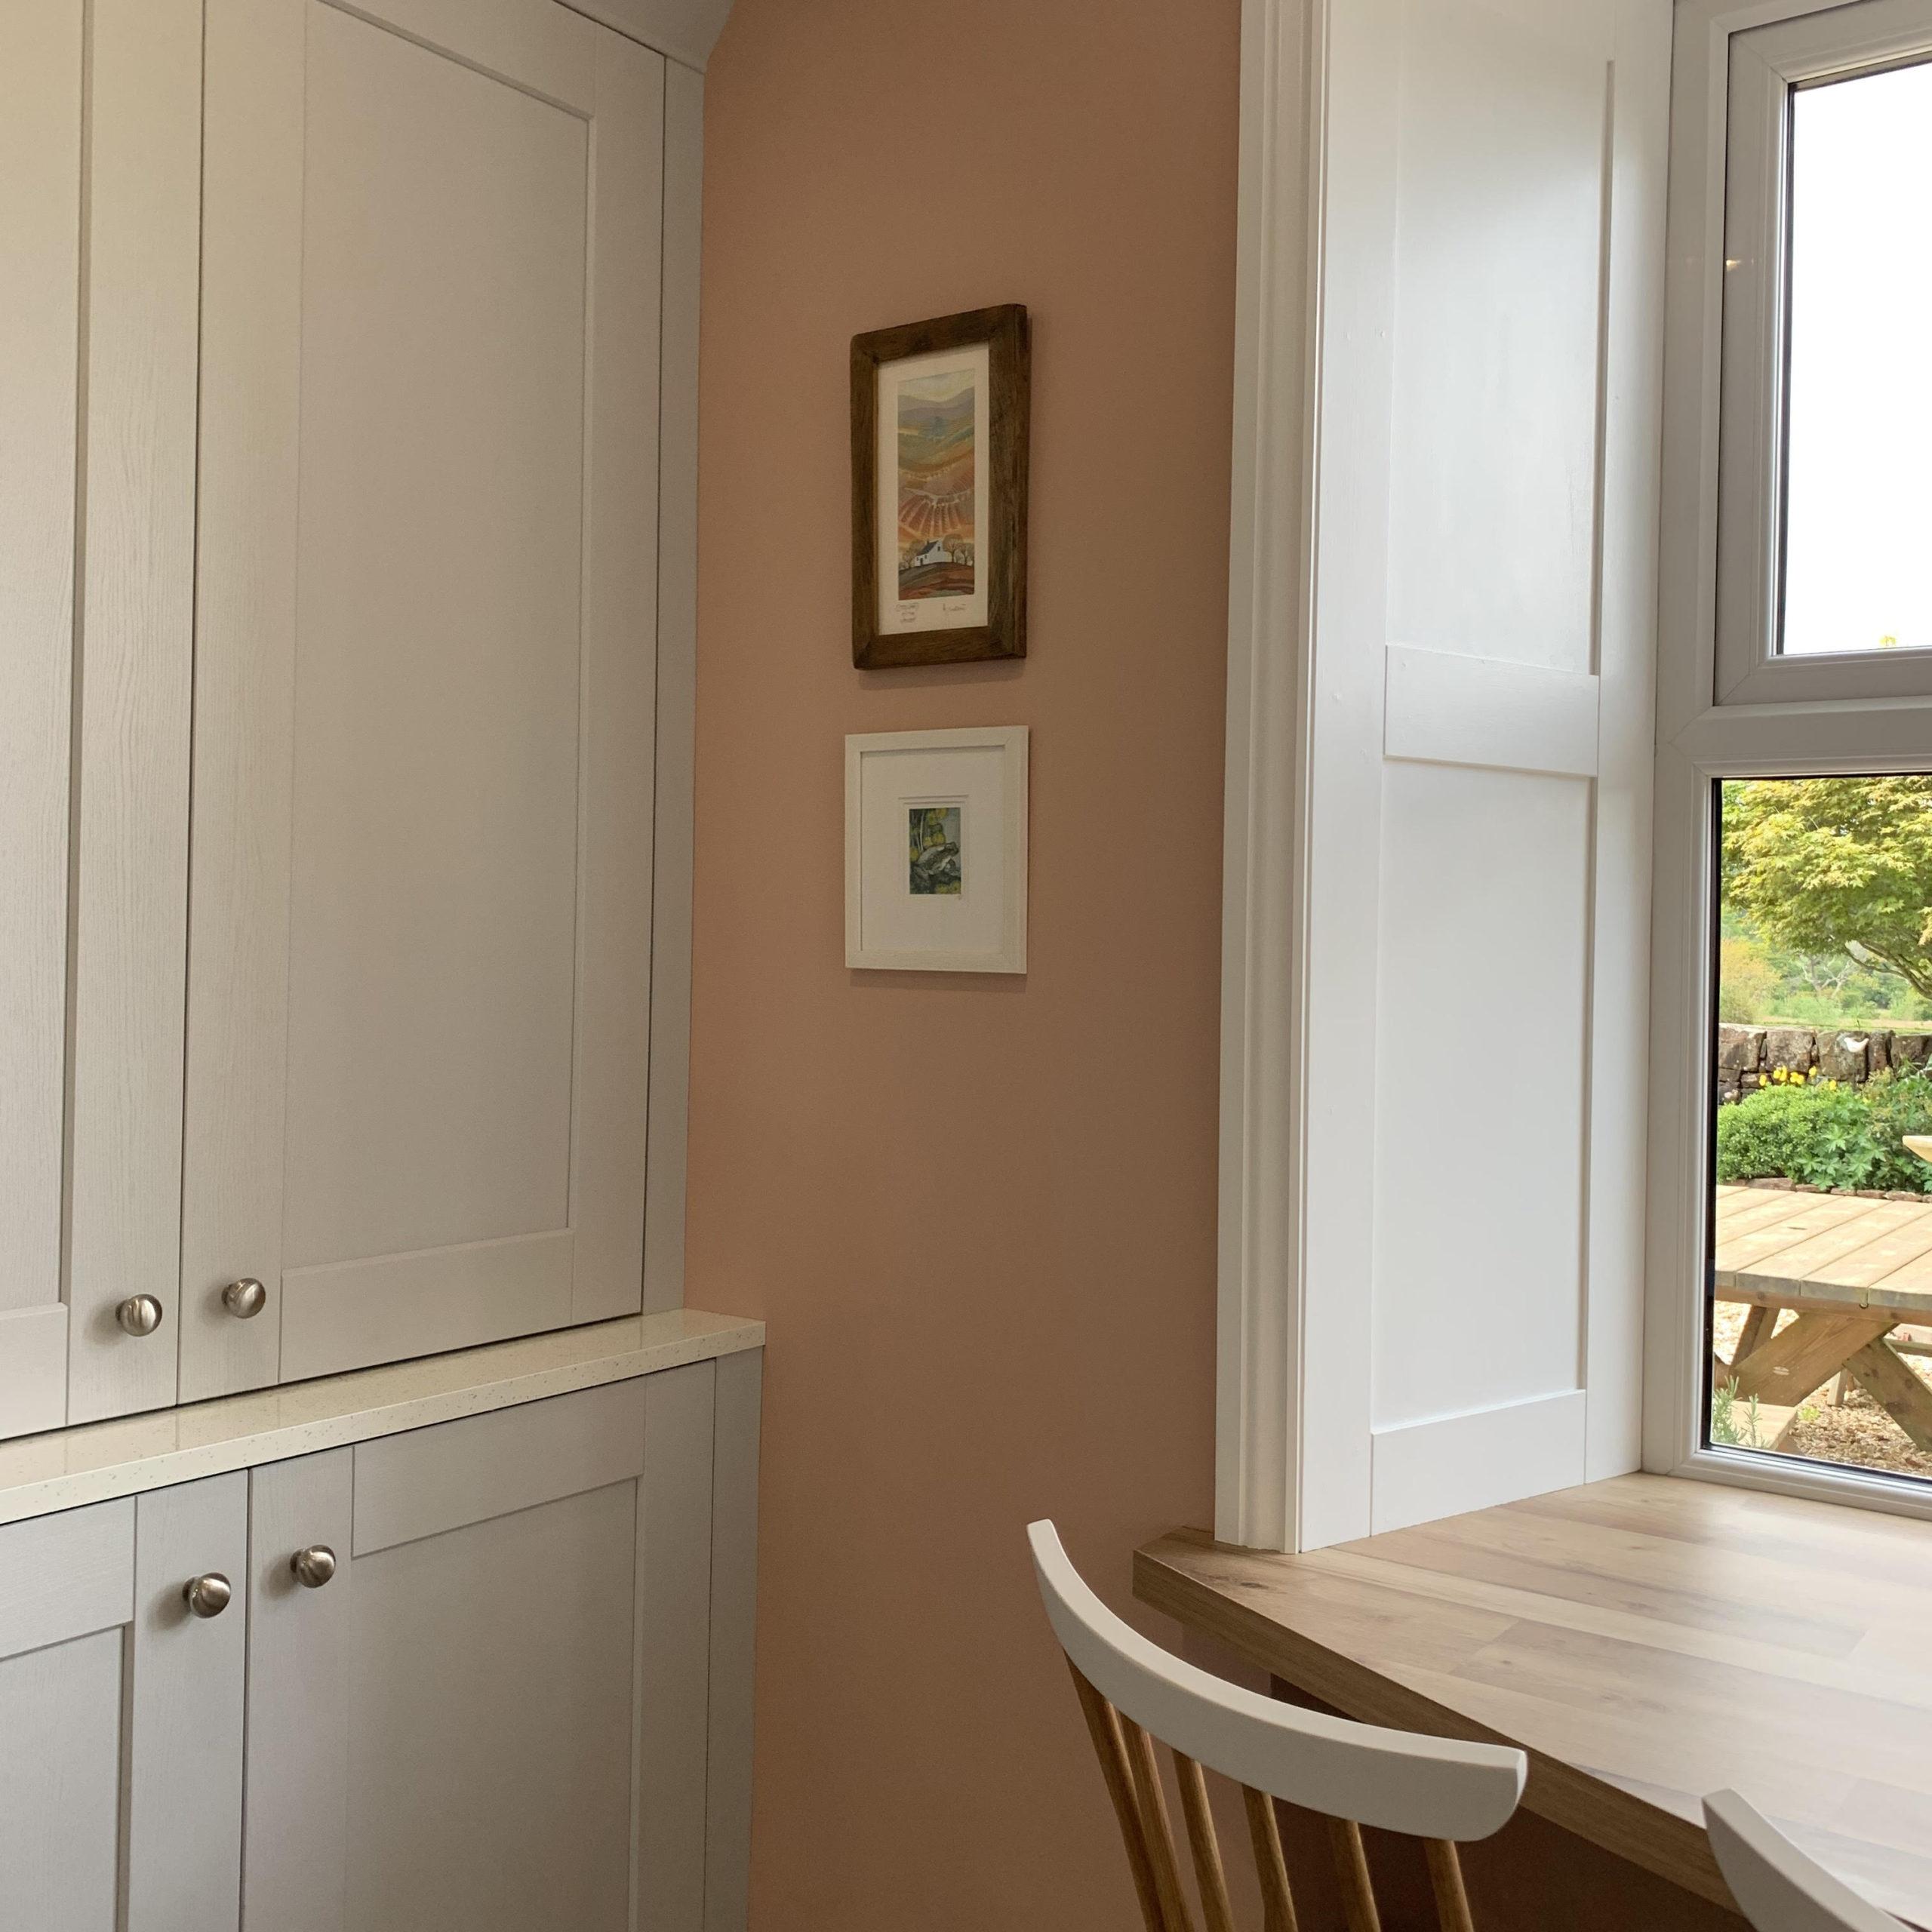 get plastered paint in kitchen diner